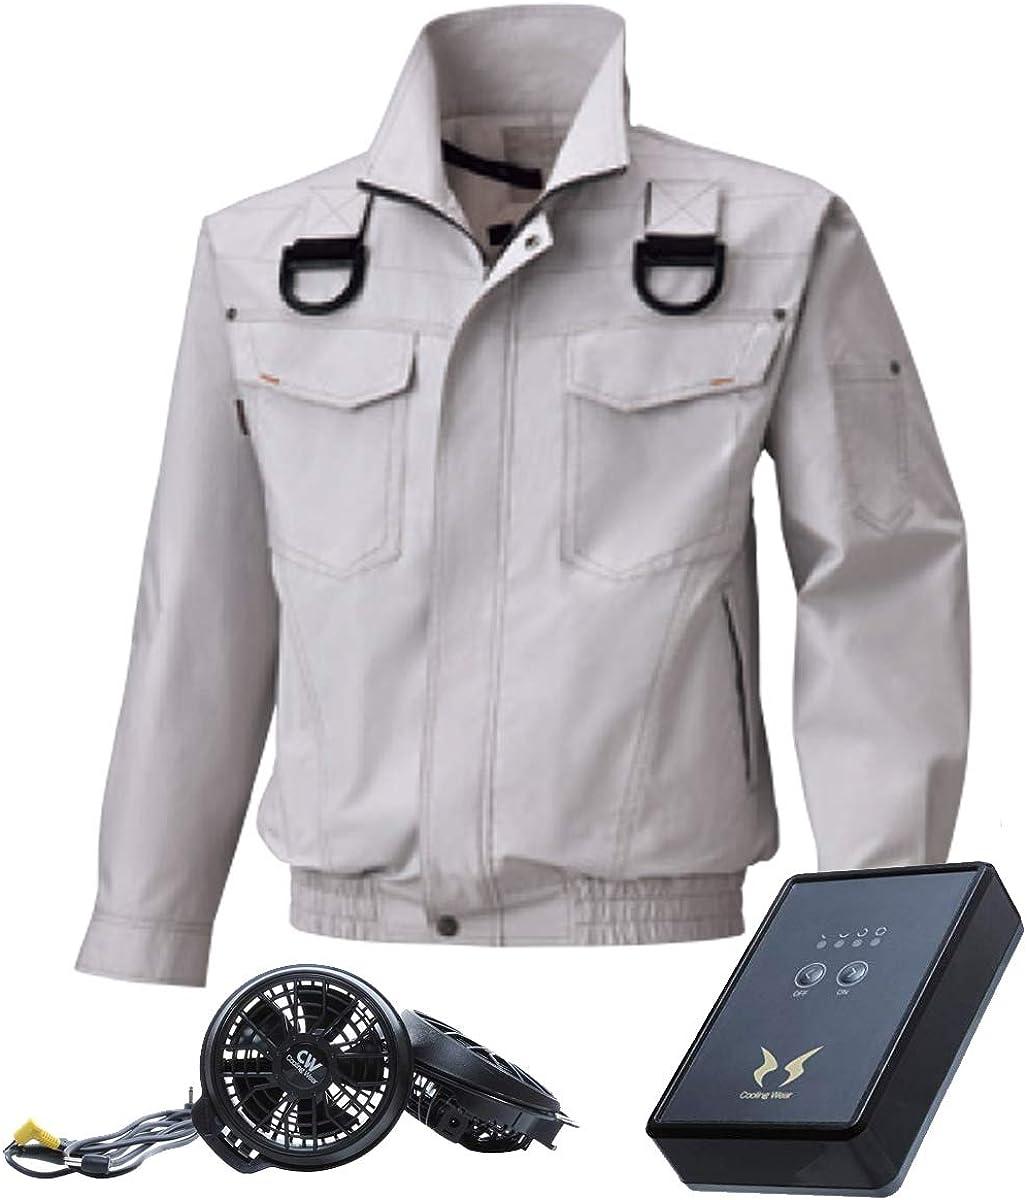 Bigborn 空調風神服 BK6047F フルハーネス 対応 長袖 ジャケット 綿100% ファン&バッテリー付 セット